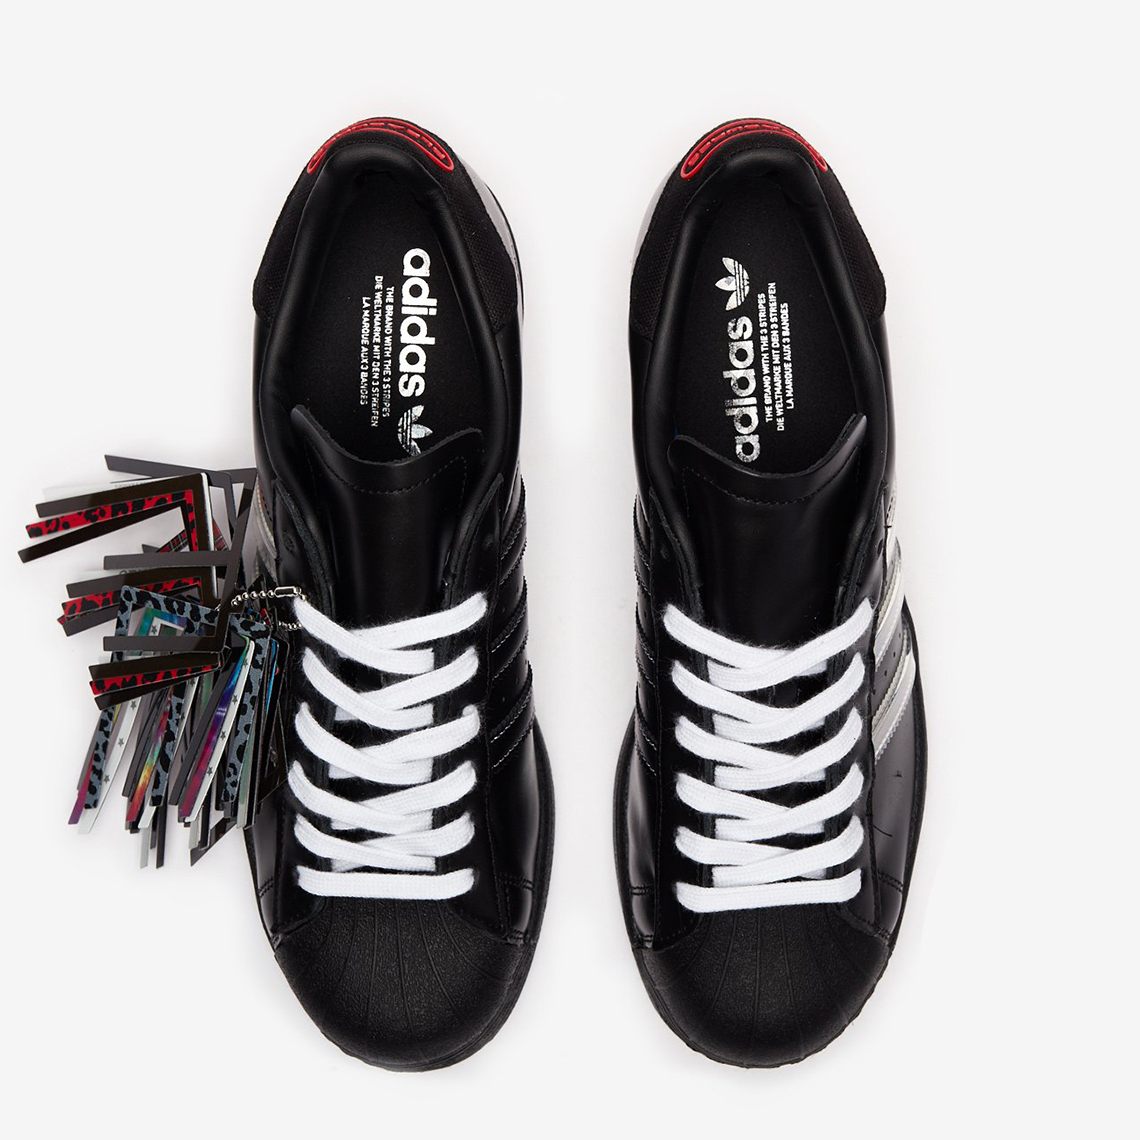 PLEASURES-adidas-Superstar-GY5691-7.jpg?w=1140